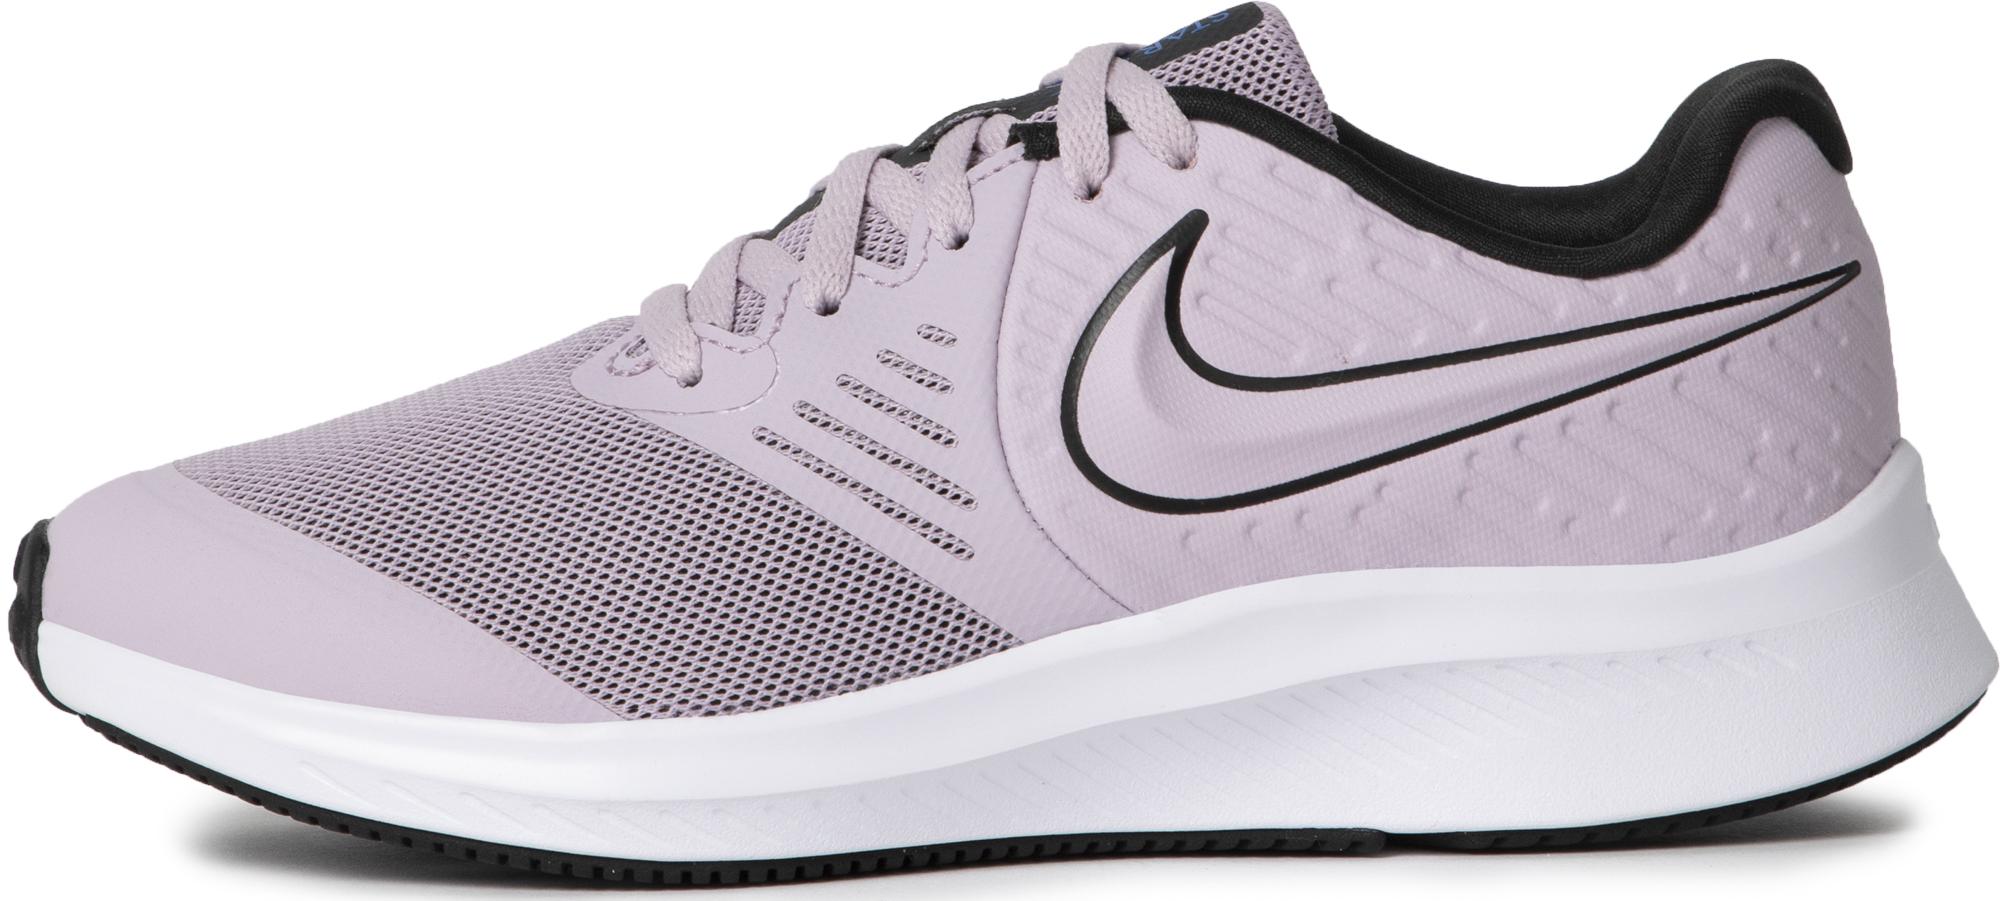 Nike Кроссовки для девочек Nike Star Runner 2 (Gs), размер 35 одежда для занятий баскетболом nike 005027 11 diy